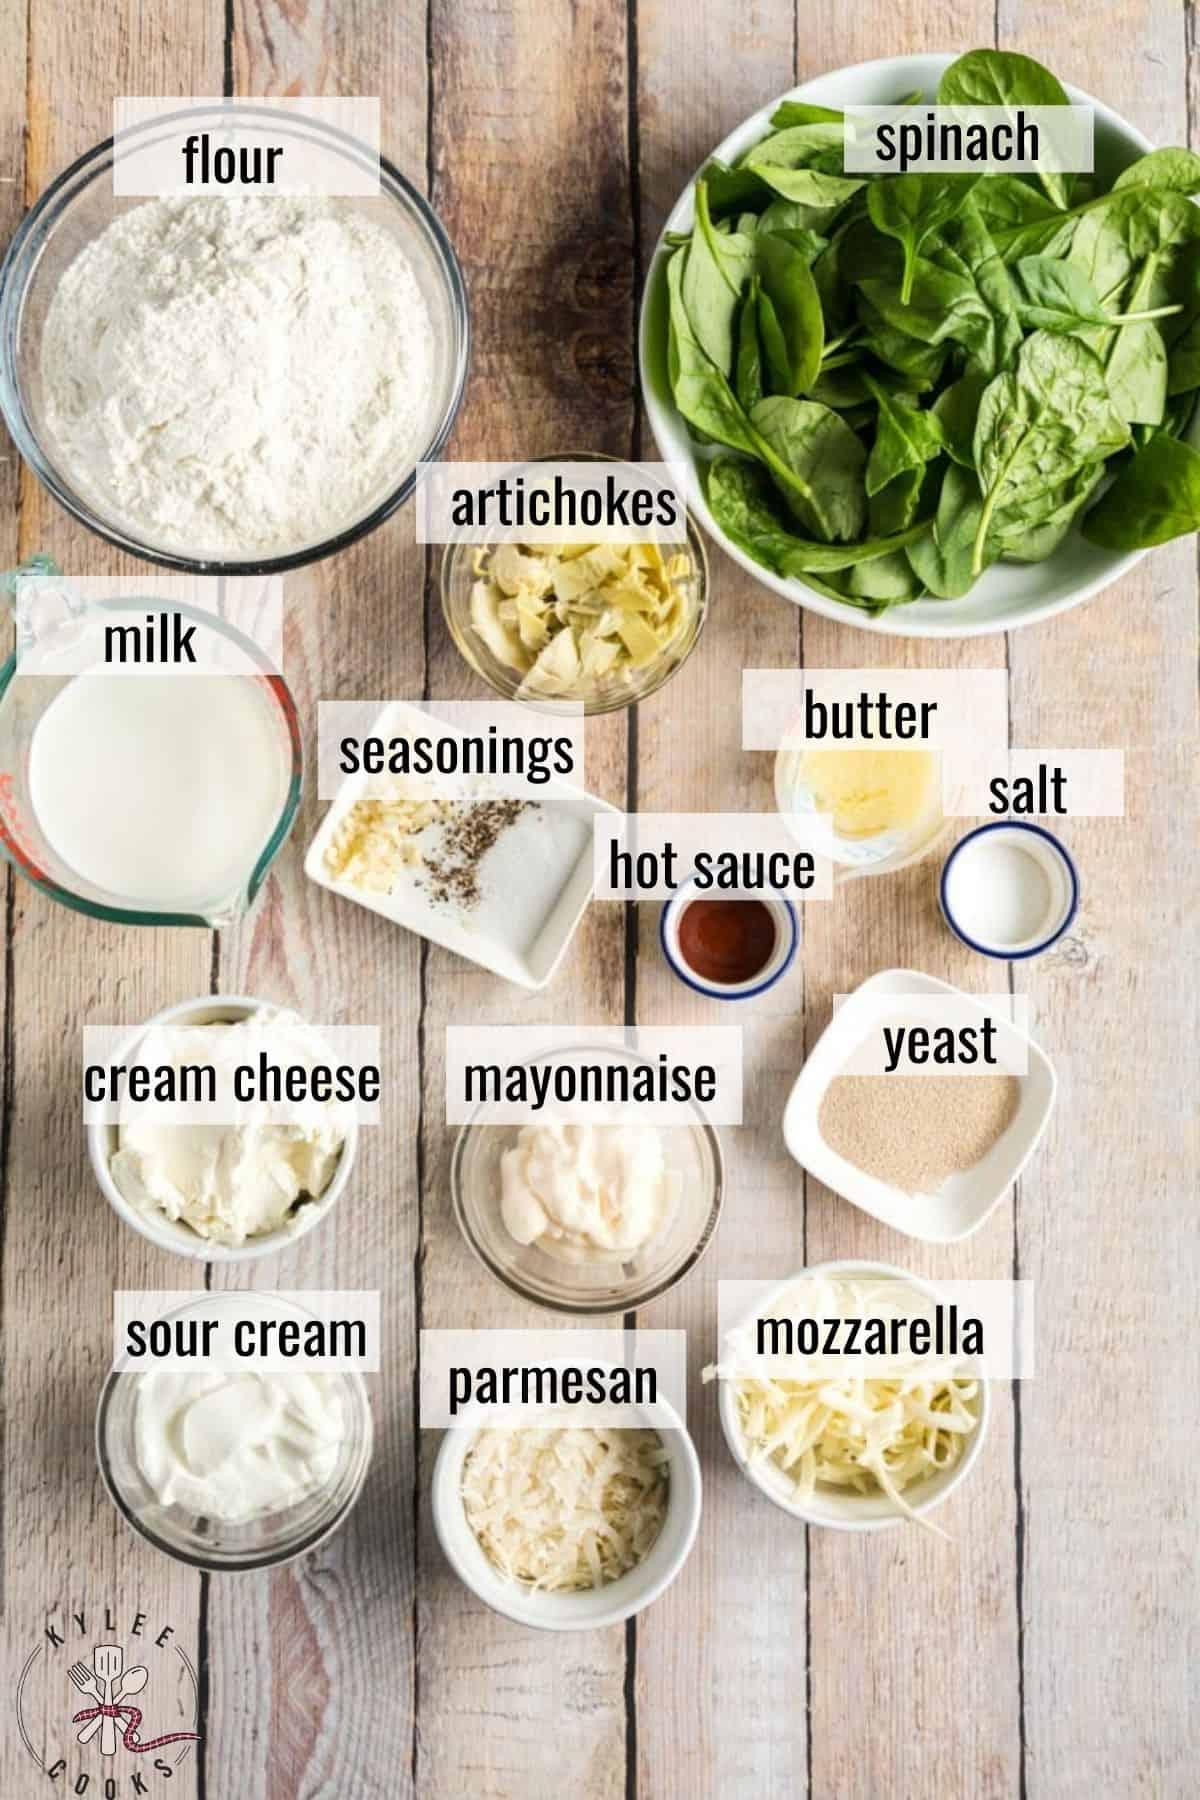 Hot Spinach Artichoke Dip ingredients